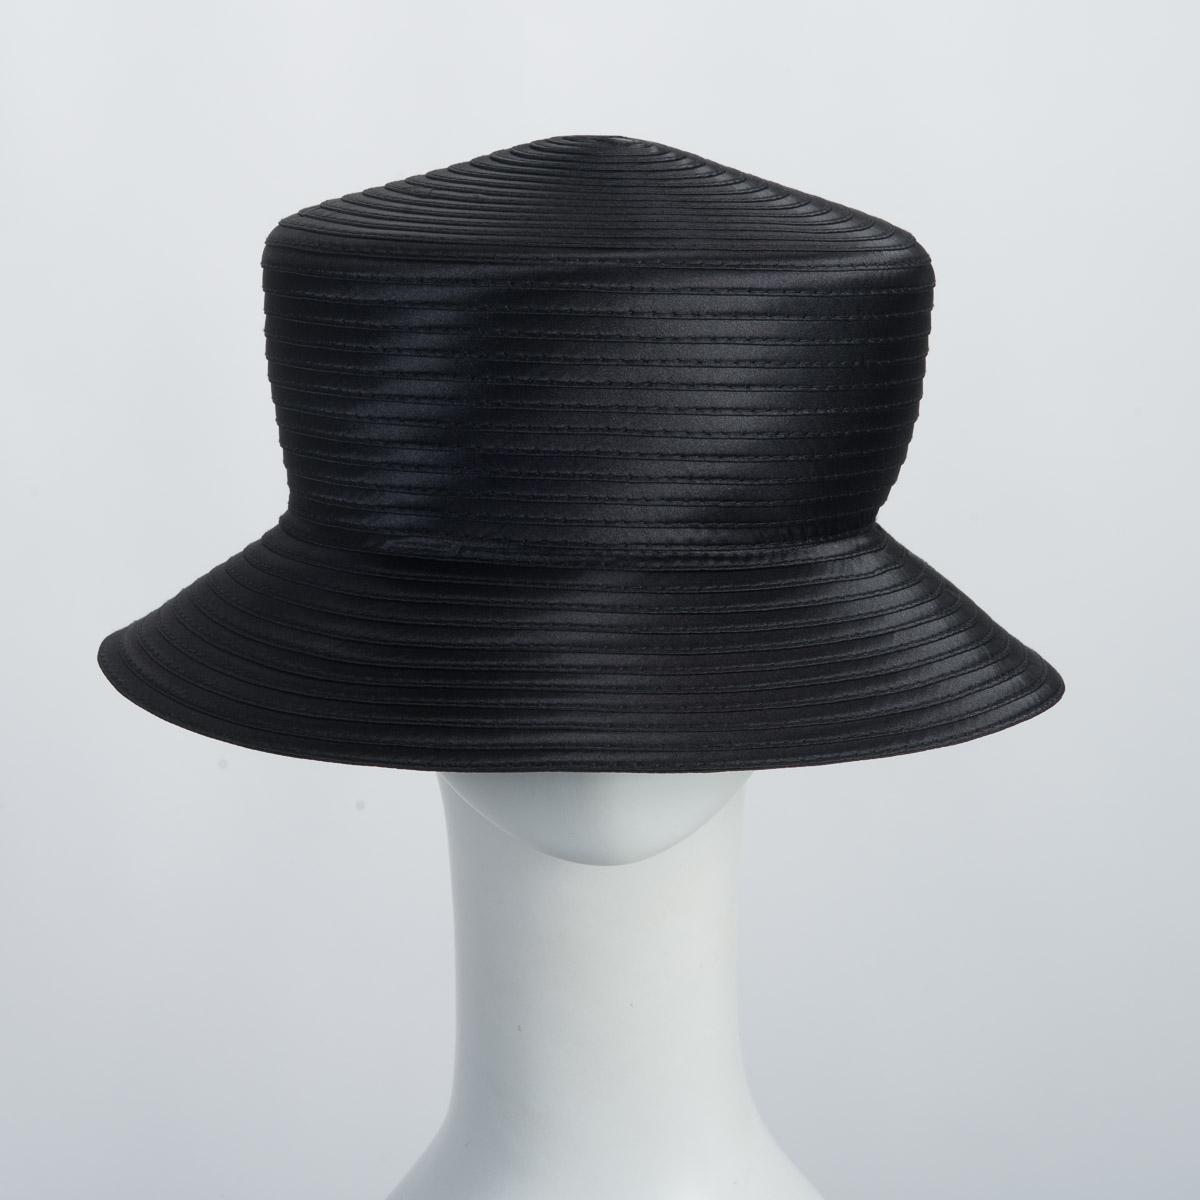 a4b262f305b Black Satin Braid Bucket Plain Hat Base Adjustable Sweatband-805109-BK- Sun  Yorkos